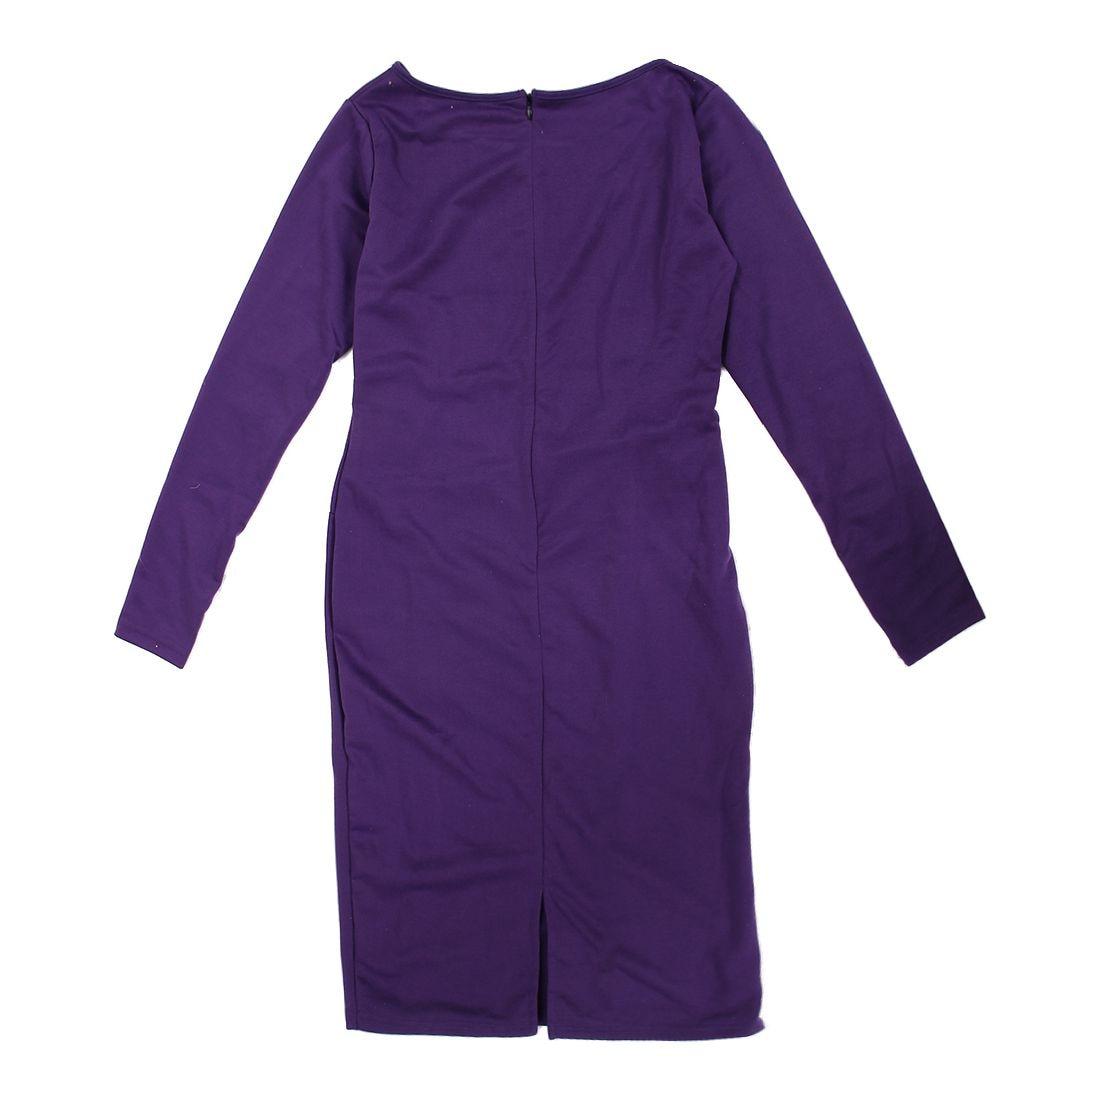 Career Female Peplum Work Dress 3/4 Sleeve O Neck Women Fashion Sheath Elegant Business Bodycon Pencil Dress